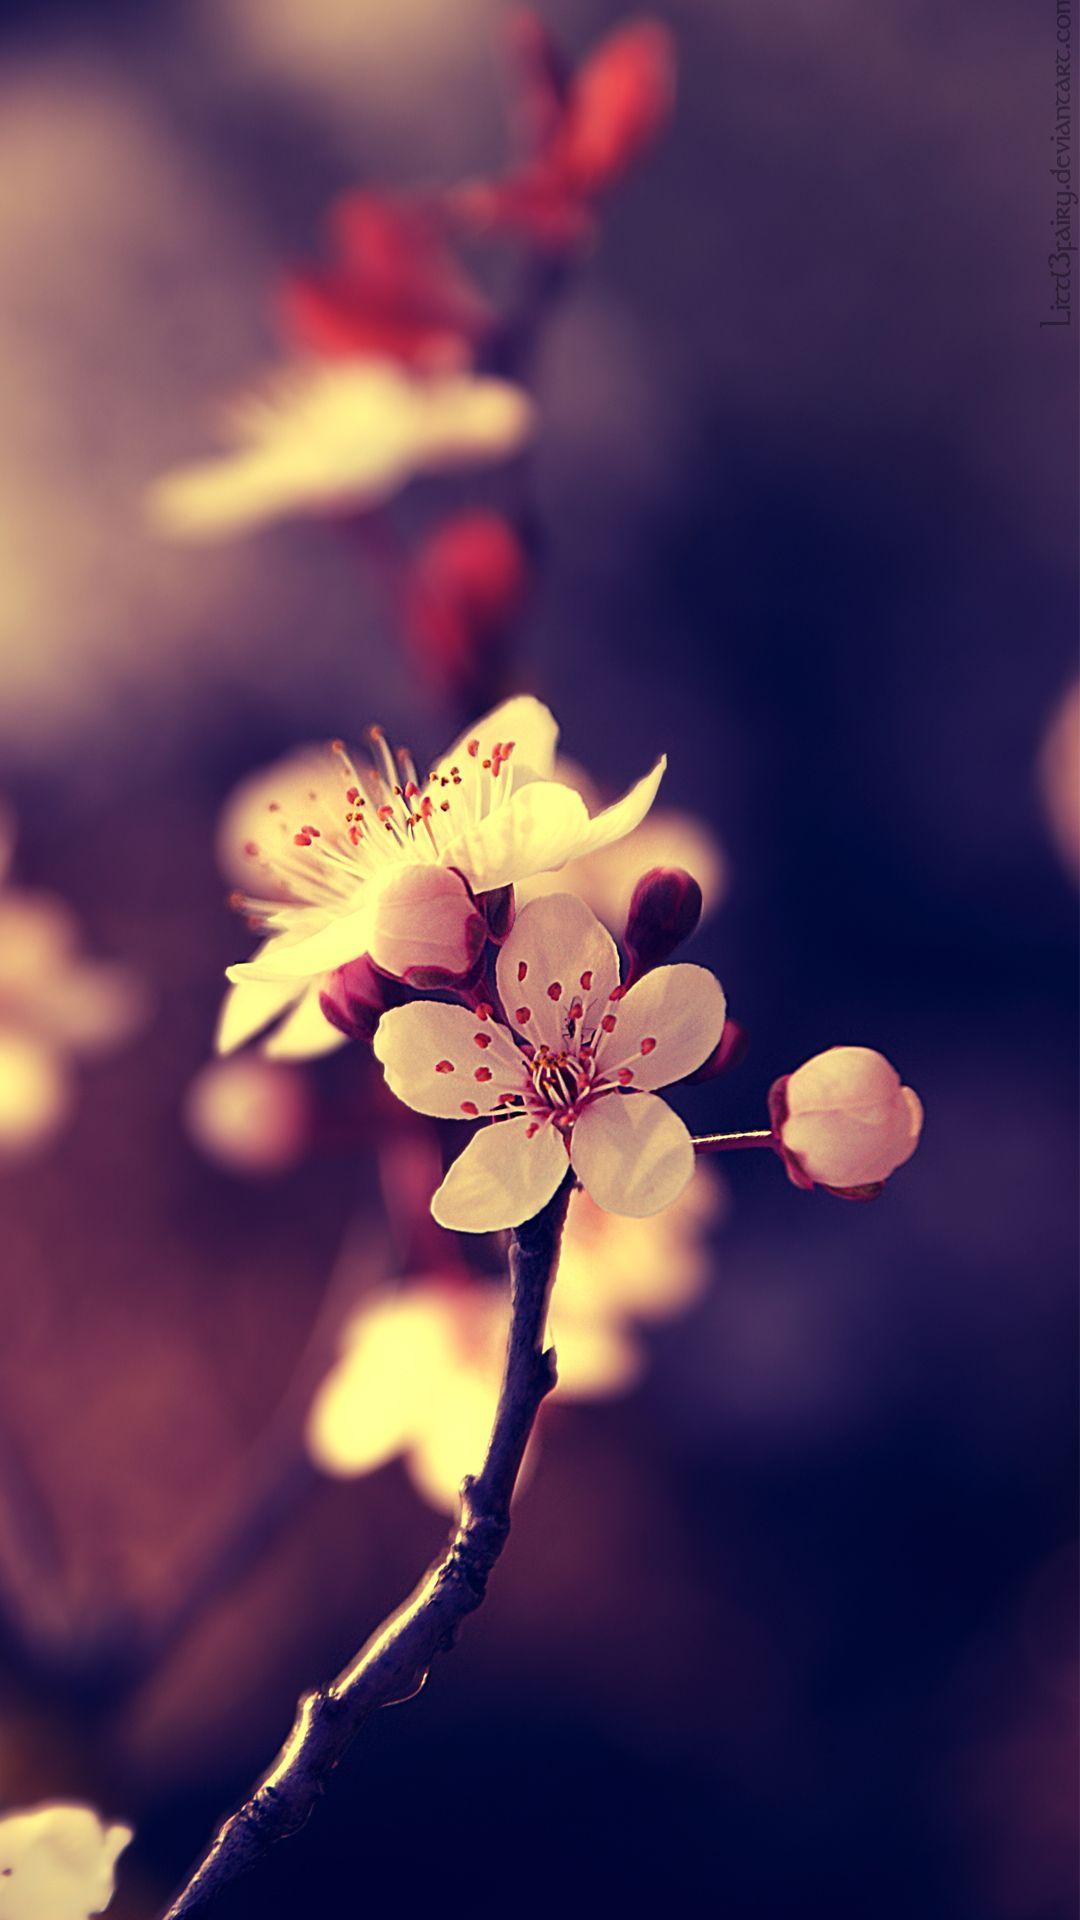 httpwwwvactualpaperscomgallerybeautiful flowers mobile hd 1080x1920